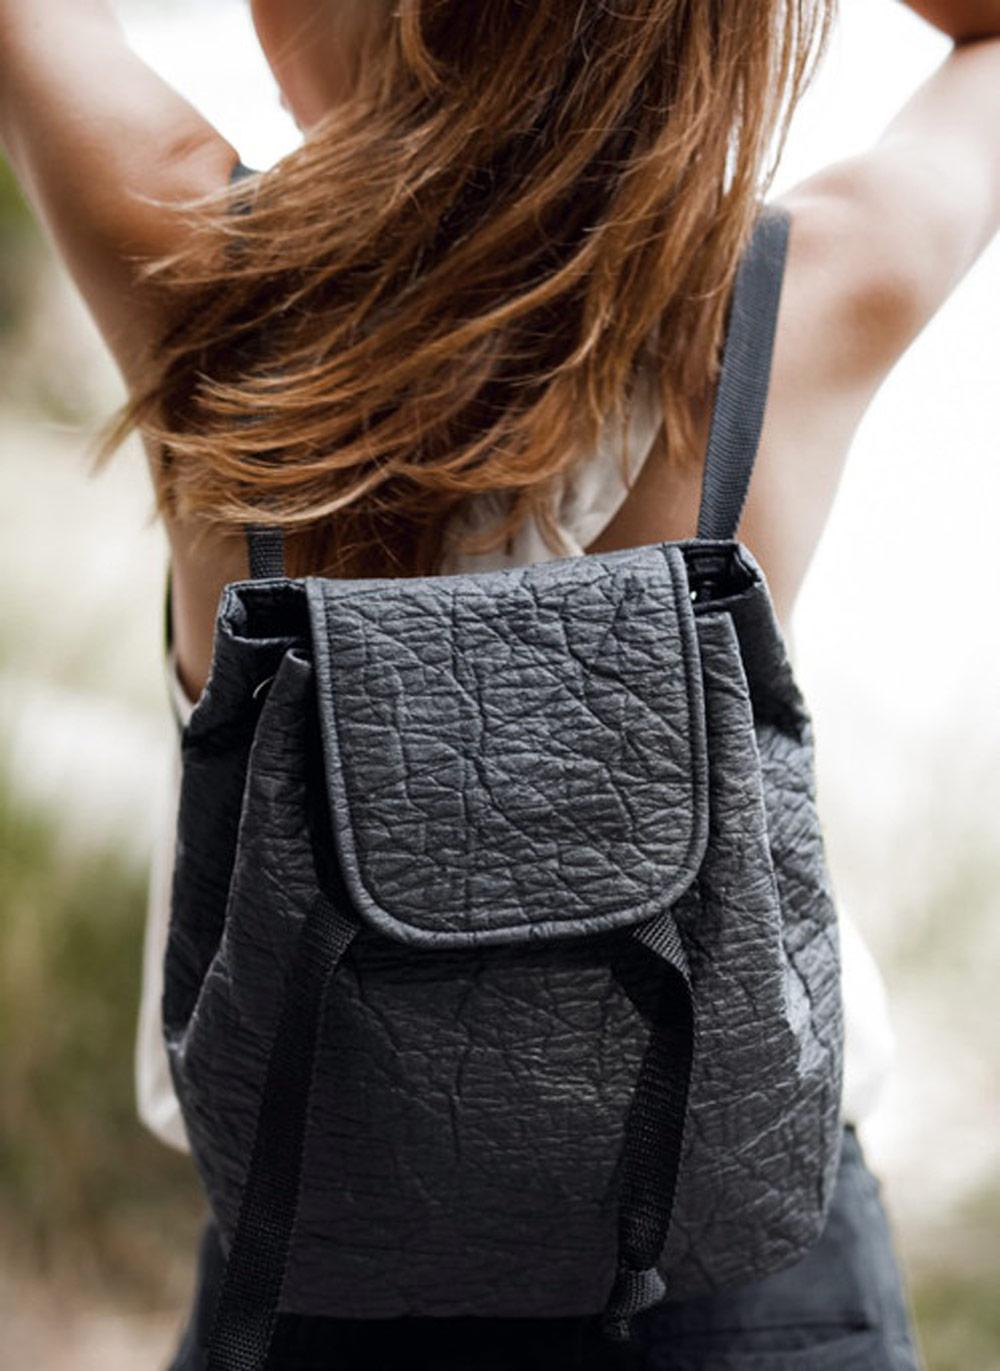 Best Vegan Bags - Maravillas MIA Pinatex backpack (style)